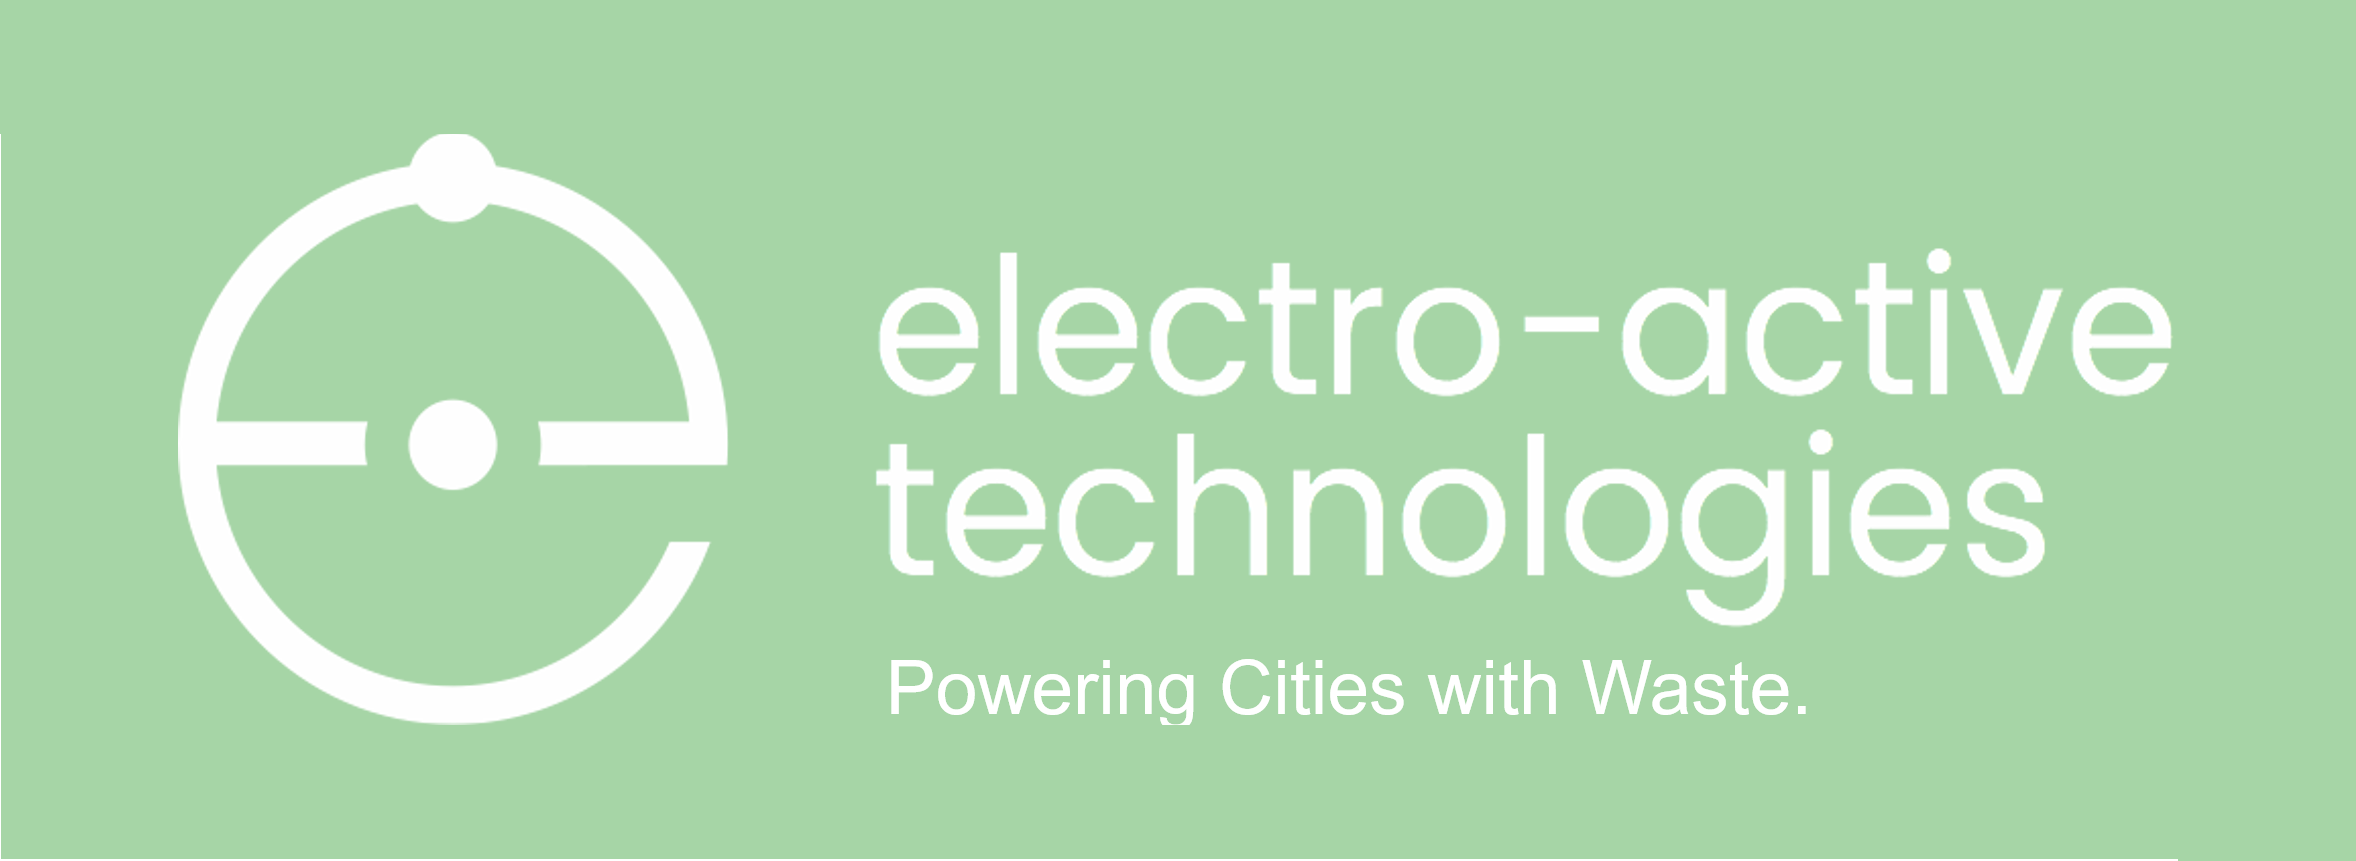 electro-active logo - Abhijeet Borole.png